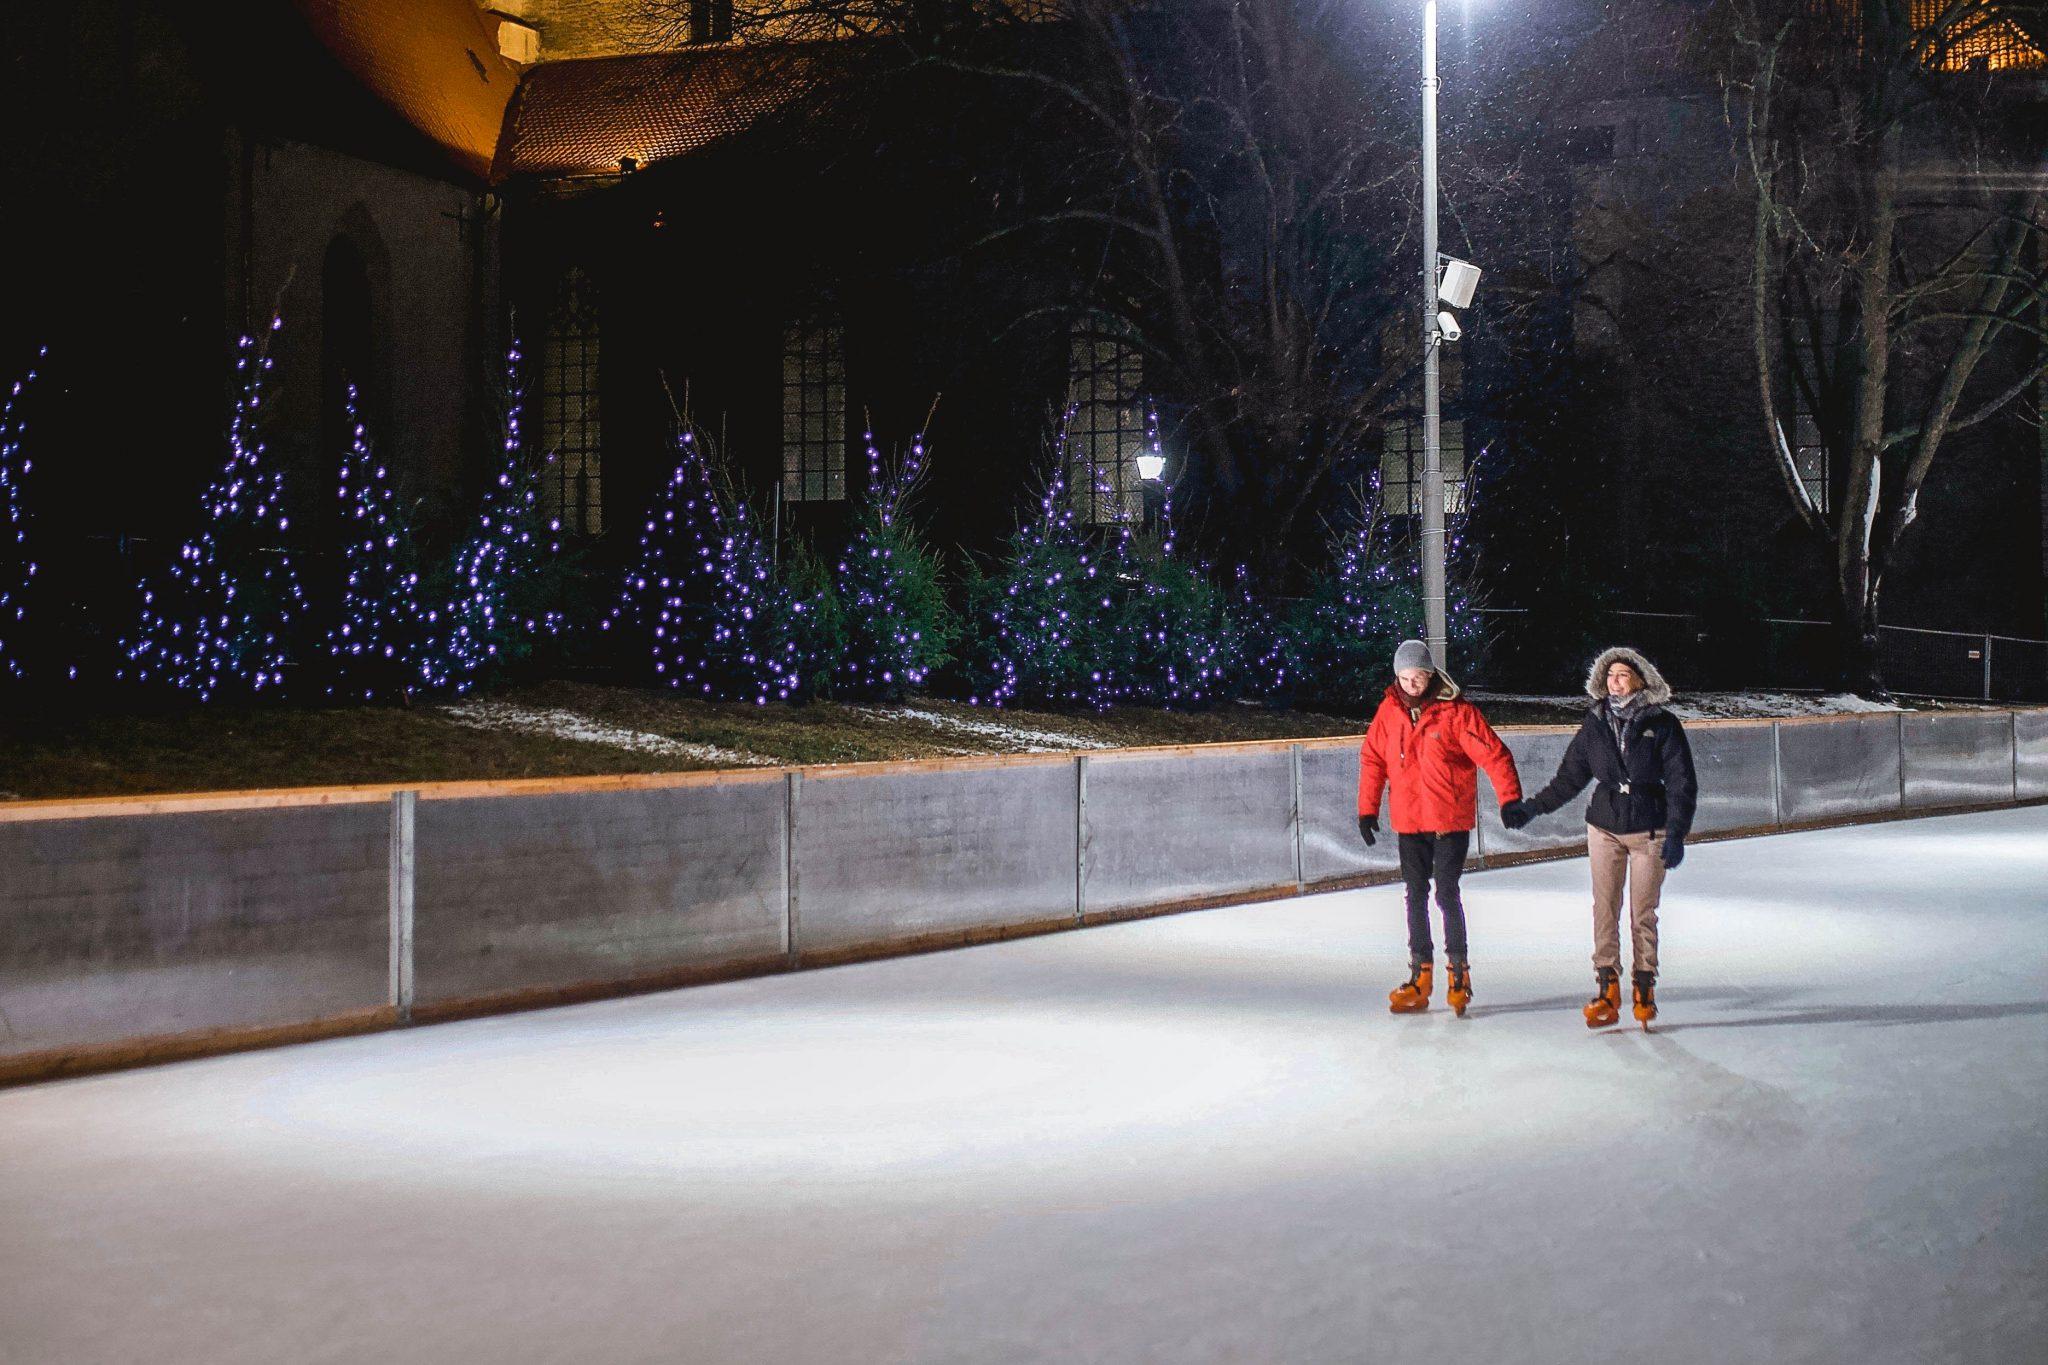 Things To Do In Tallinn In Winter Tallinn Things To Do - Ice Skating Tallinn Estonia